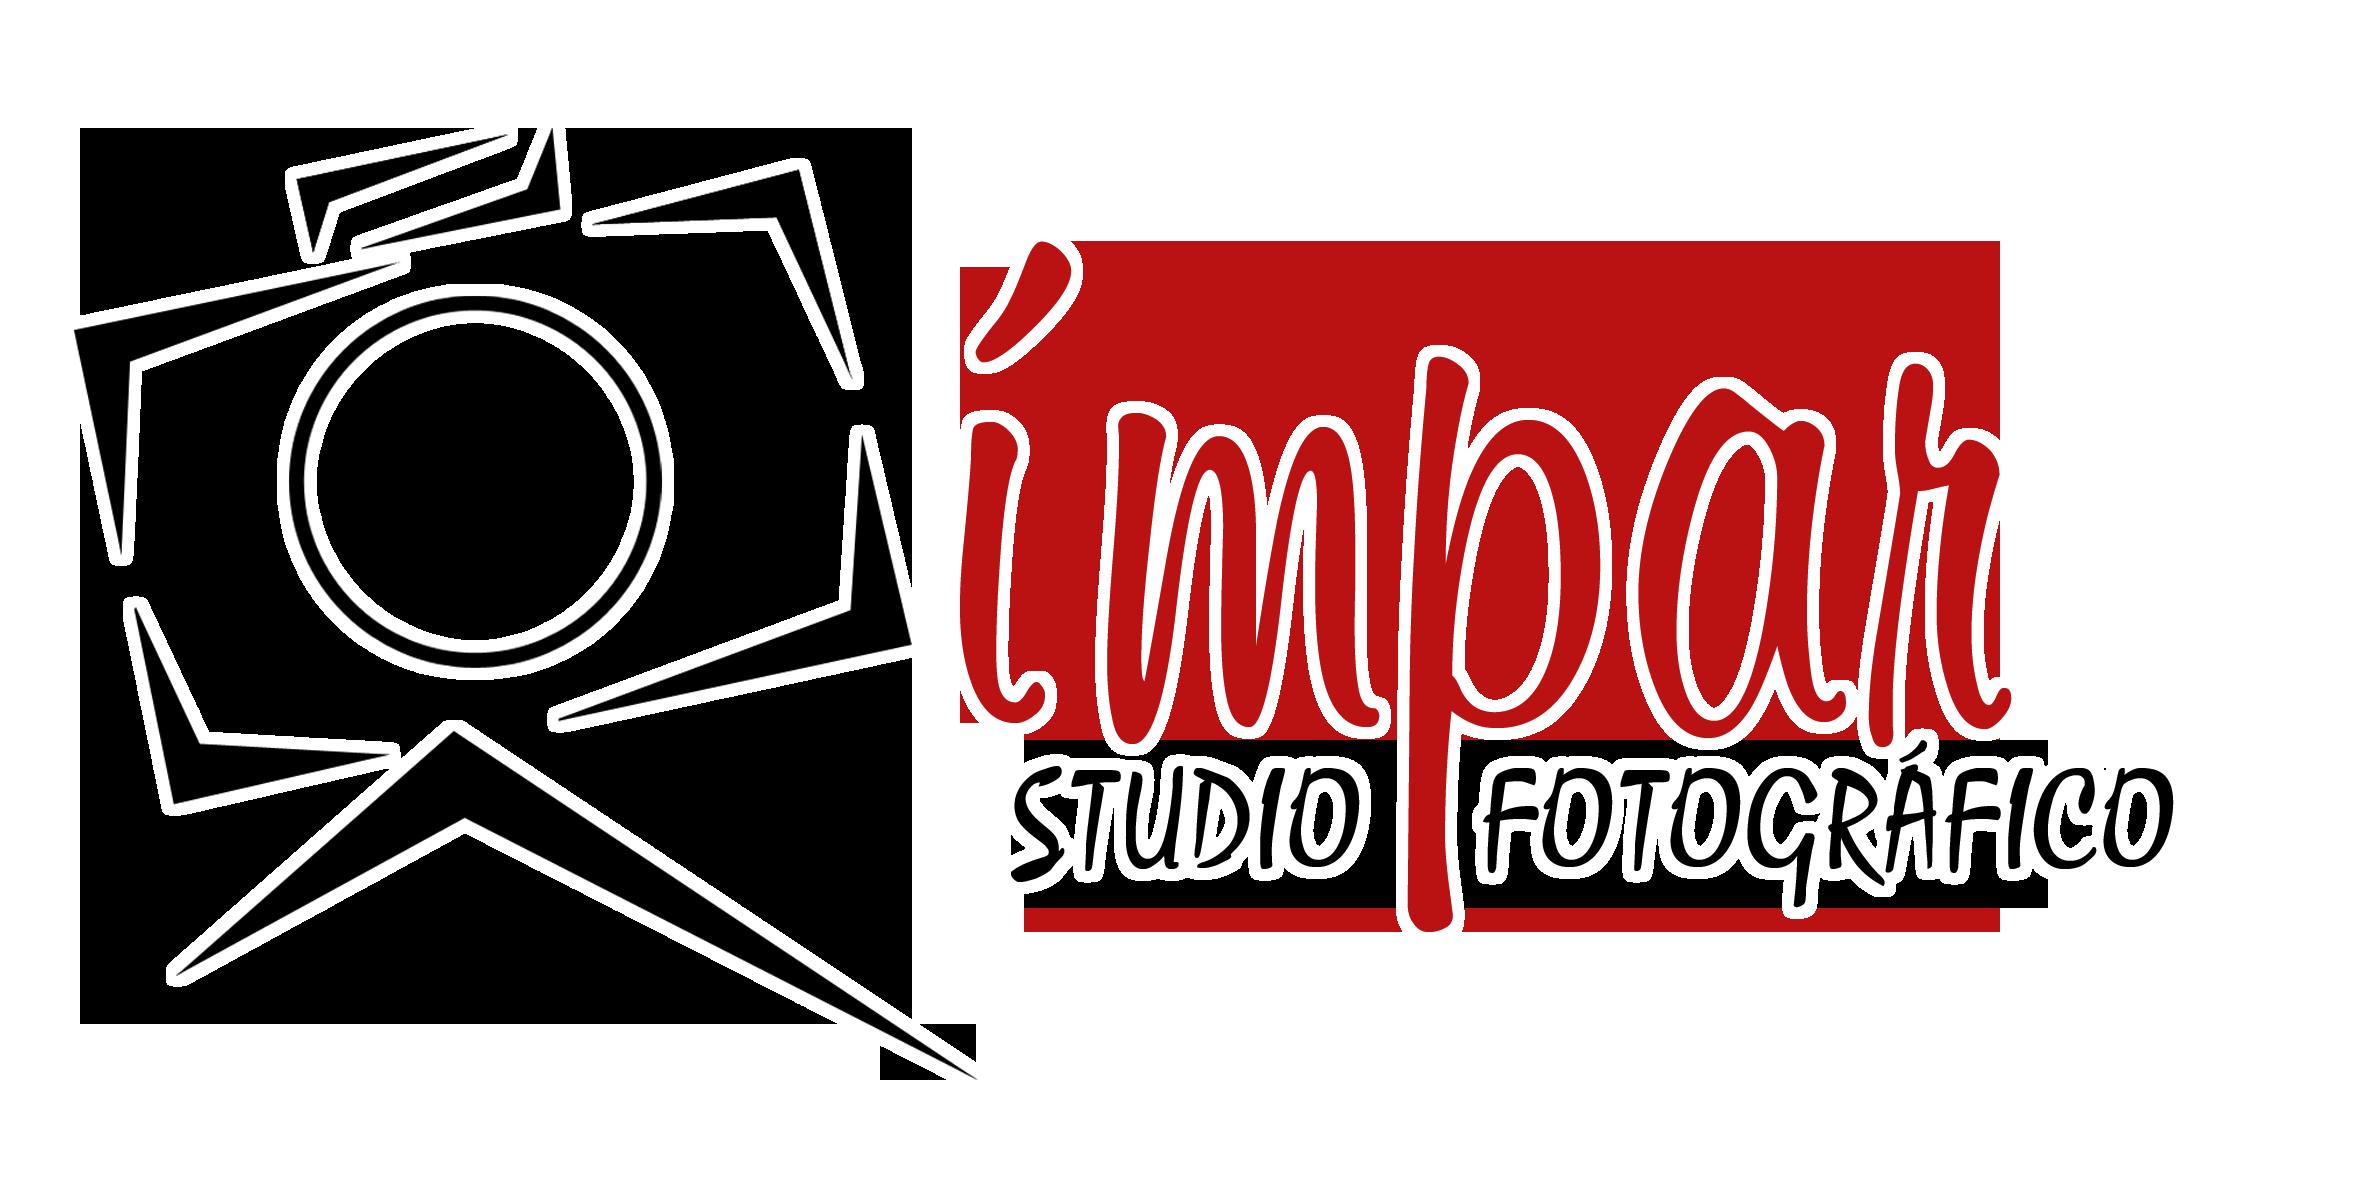 Sobre Fotografia de Gestante e Família - Studio Ímpar - Cuiabá e Várzea Grande - MT